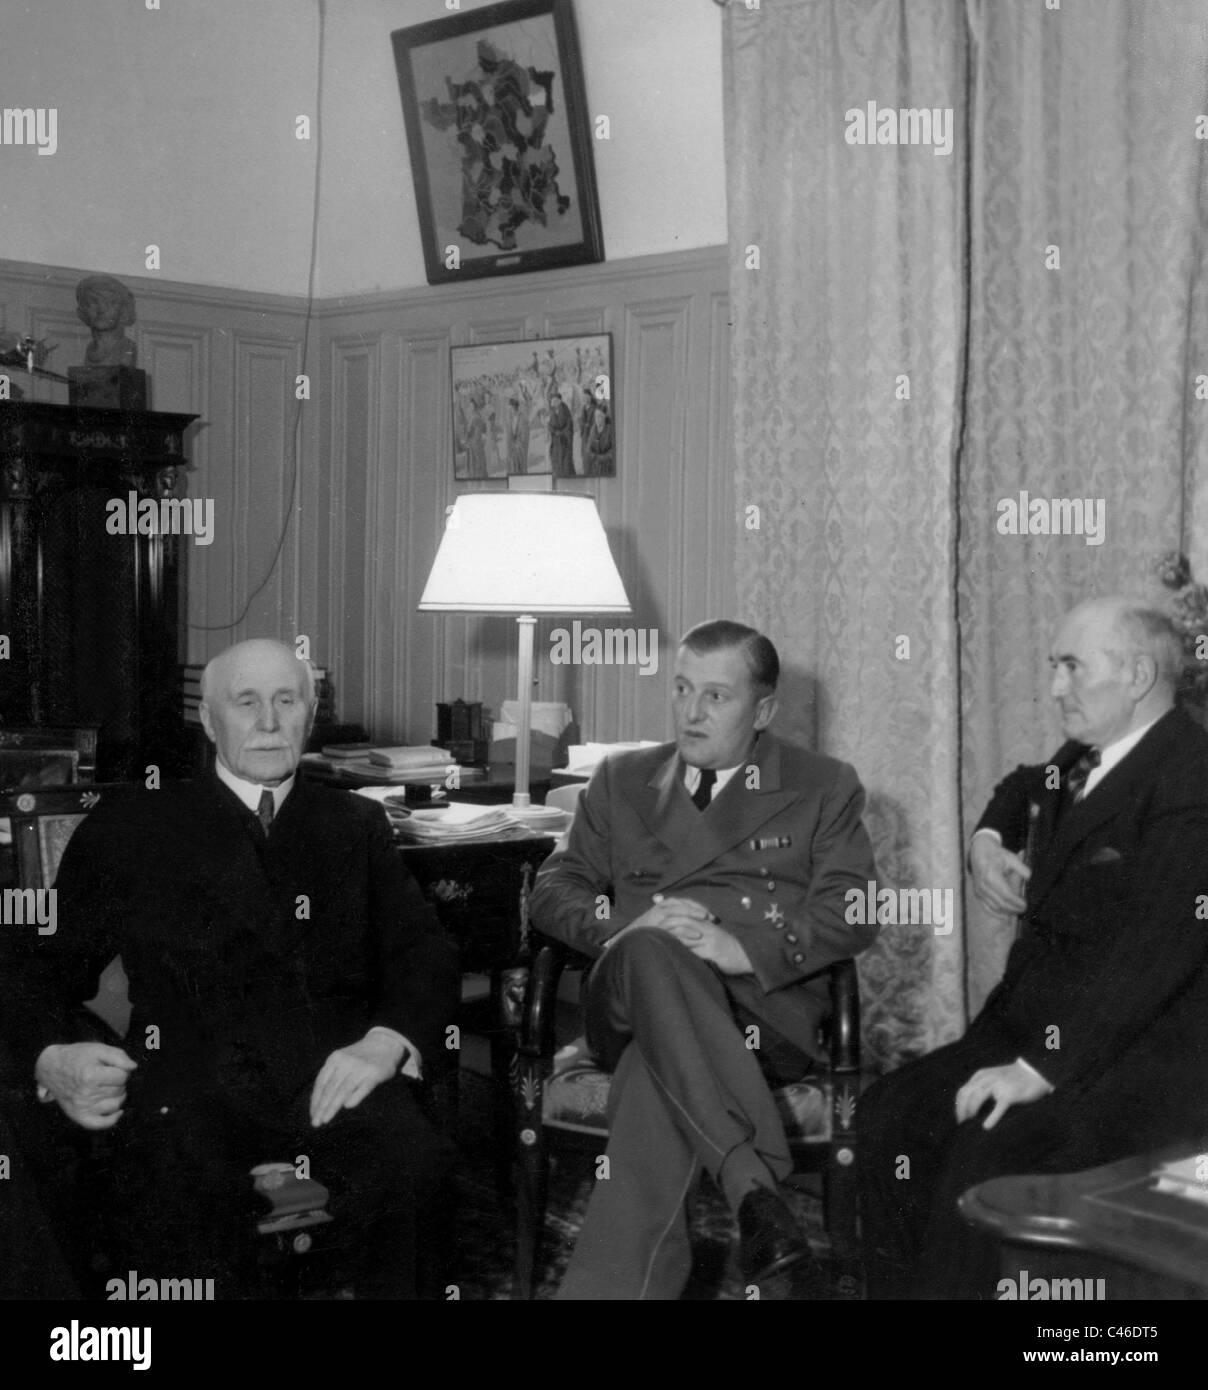 Henri Philippe Petain, Otto Abetz and Admiral Darlan, 1941 - Stock Image